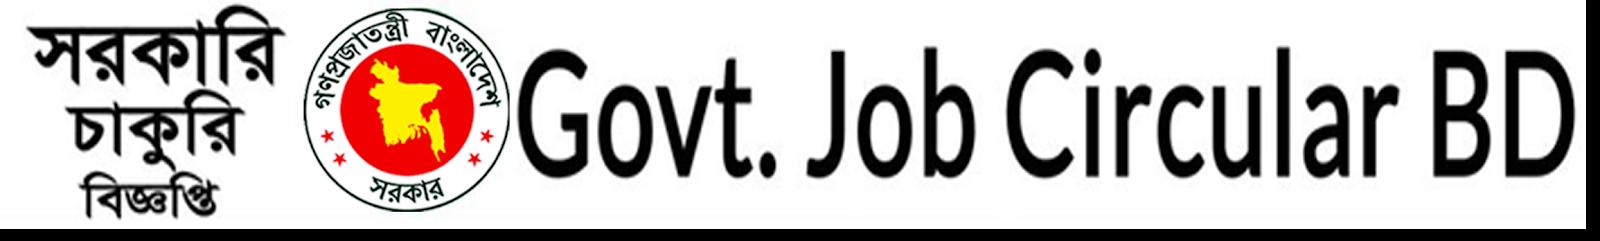 Govt. Job Circular BD